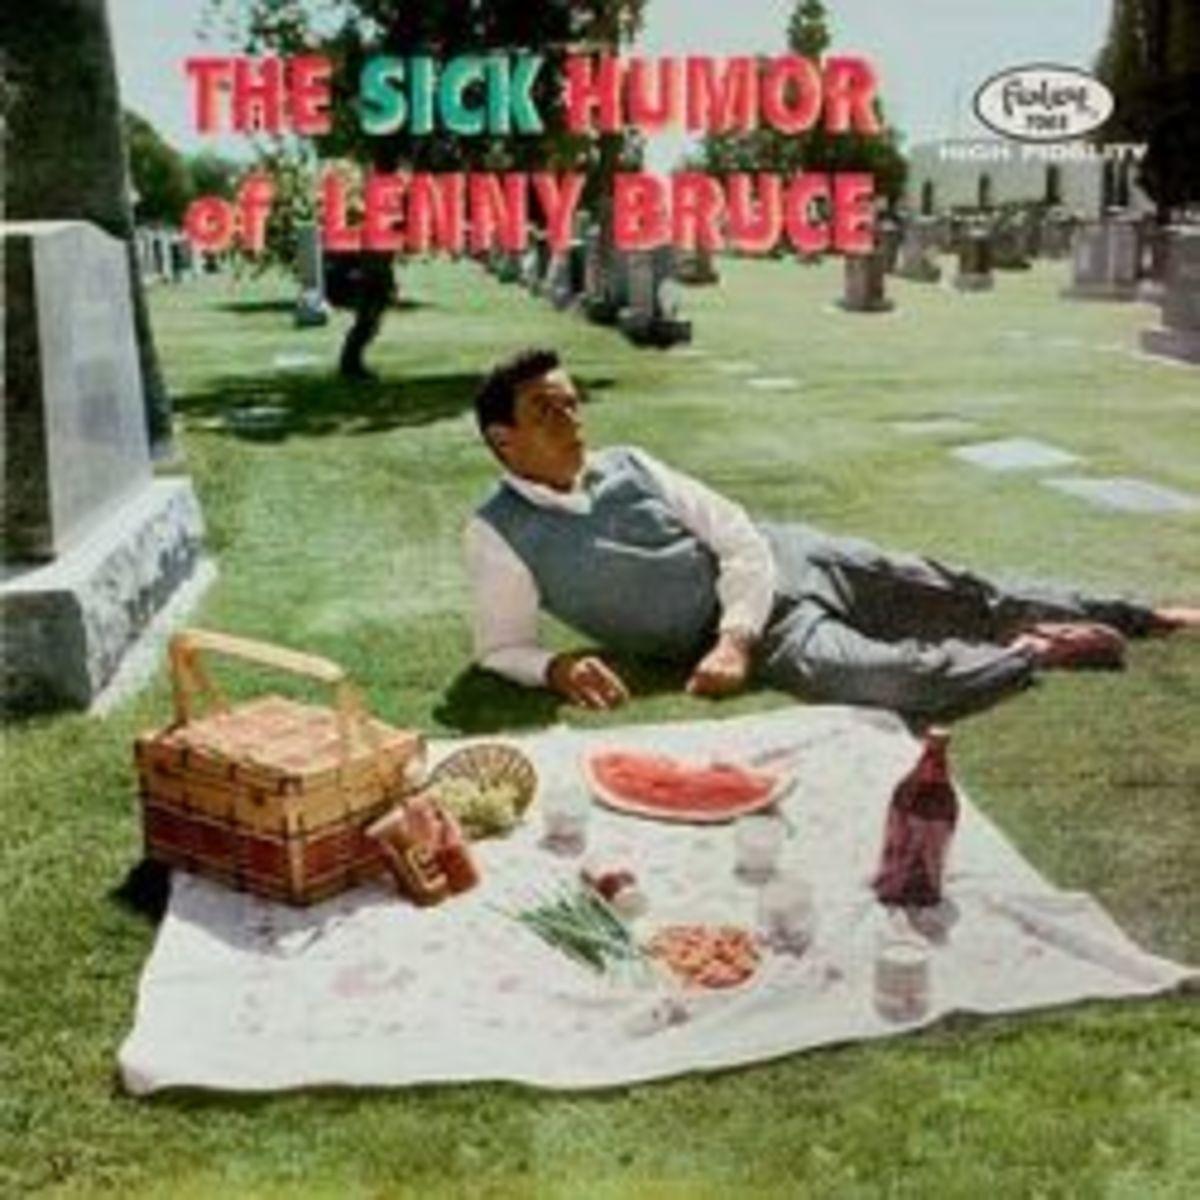 "Lenny Bruce ""The Sick Humor of Lenny Bruce"" Fantasy Records 7003 12"" LP Red Vinyl Record"